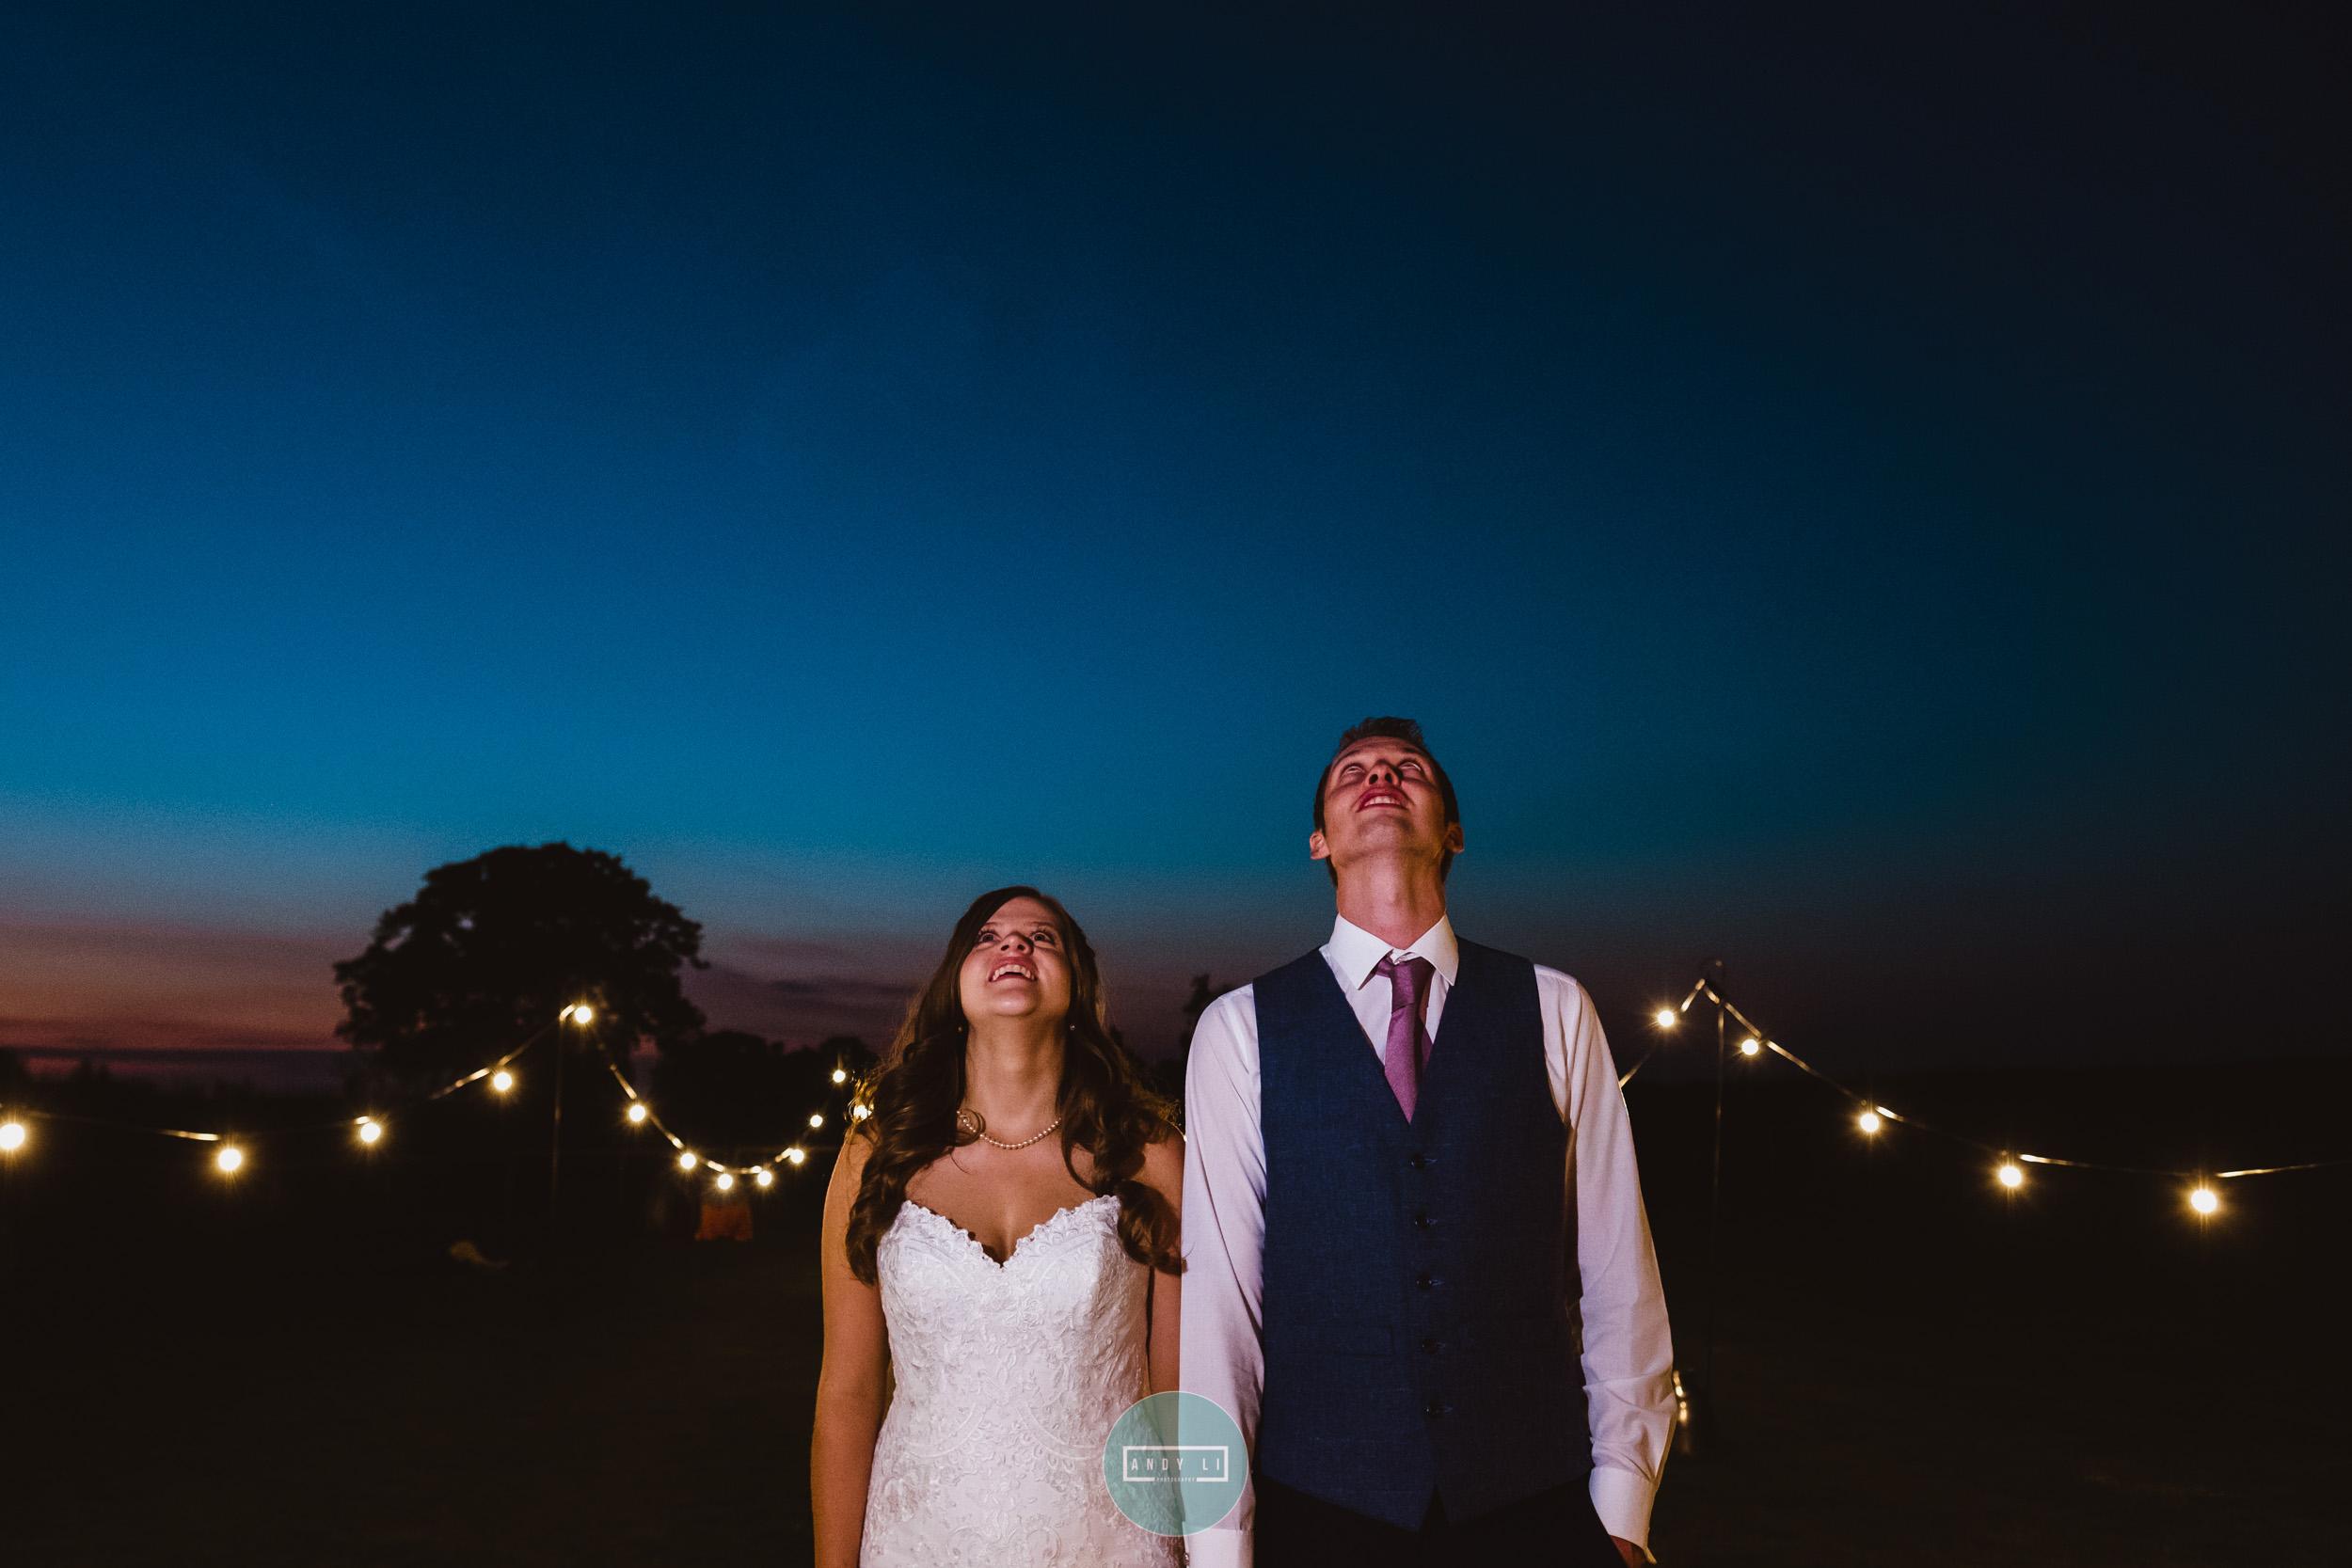 Shropshire DIY Marquee Wedding-147-XPRO1179.jpg